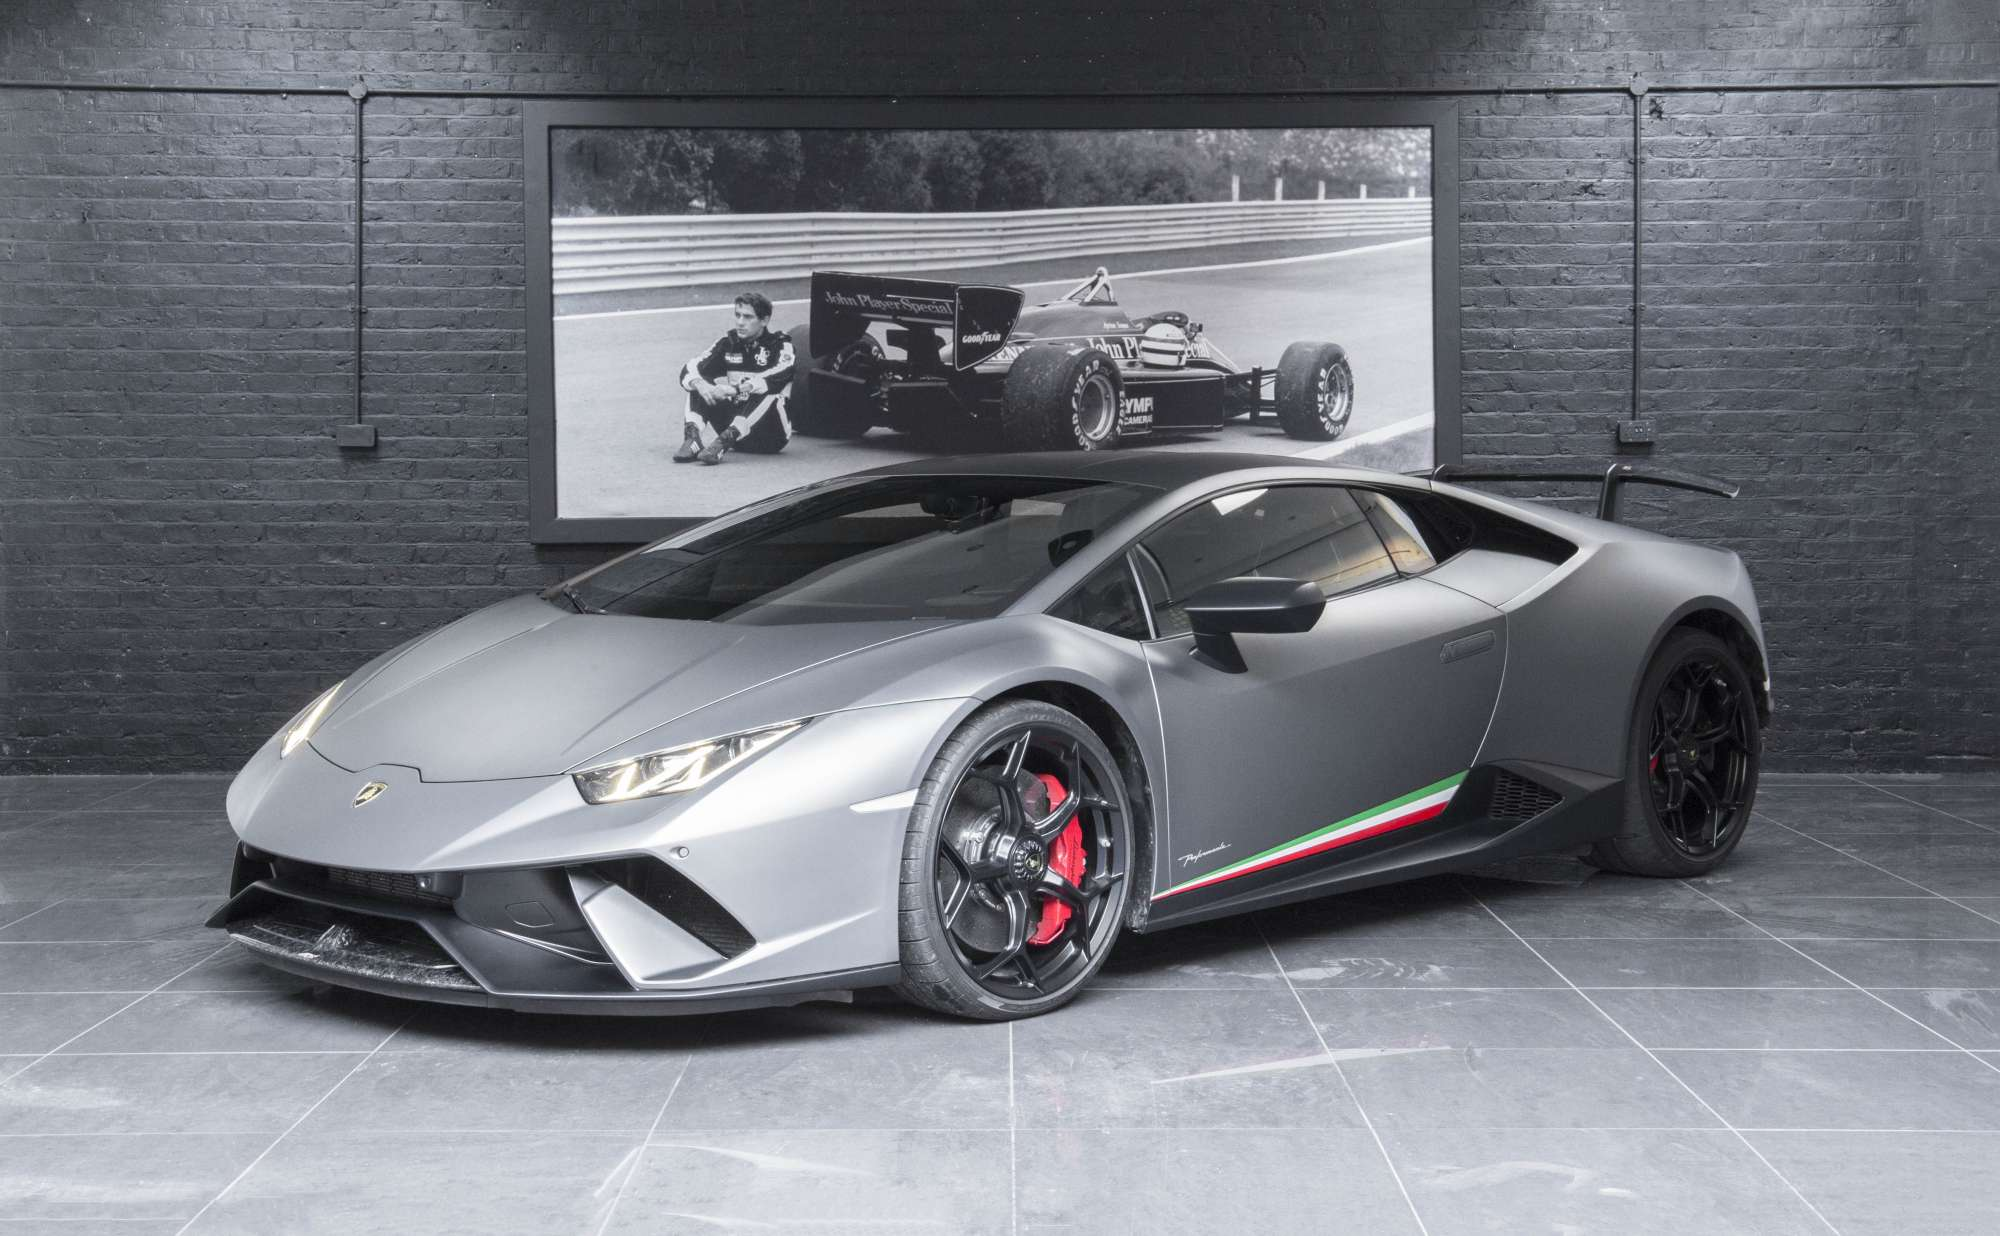 Lhd Lamborghini Huracan Performante Pegasus Auto House